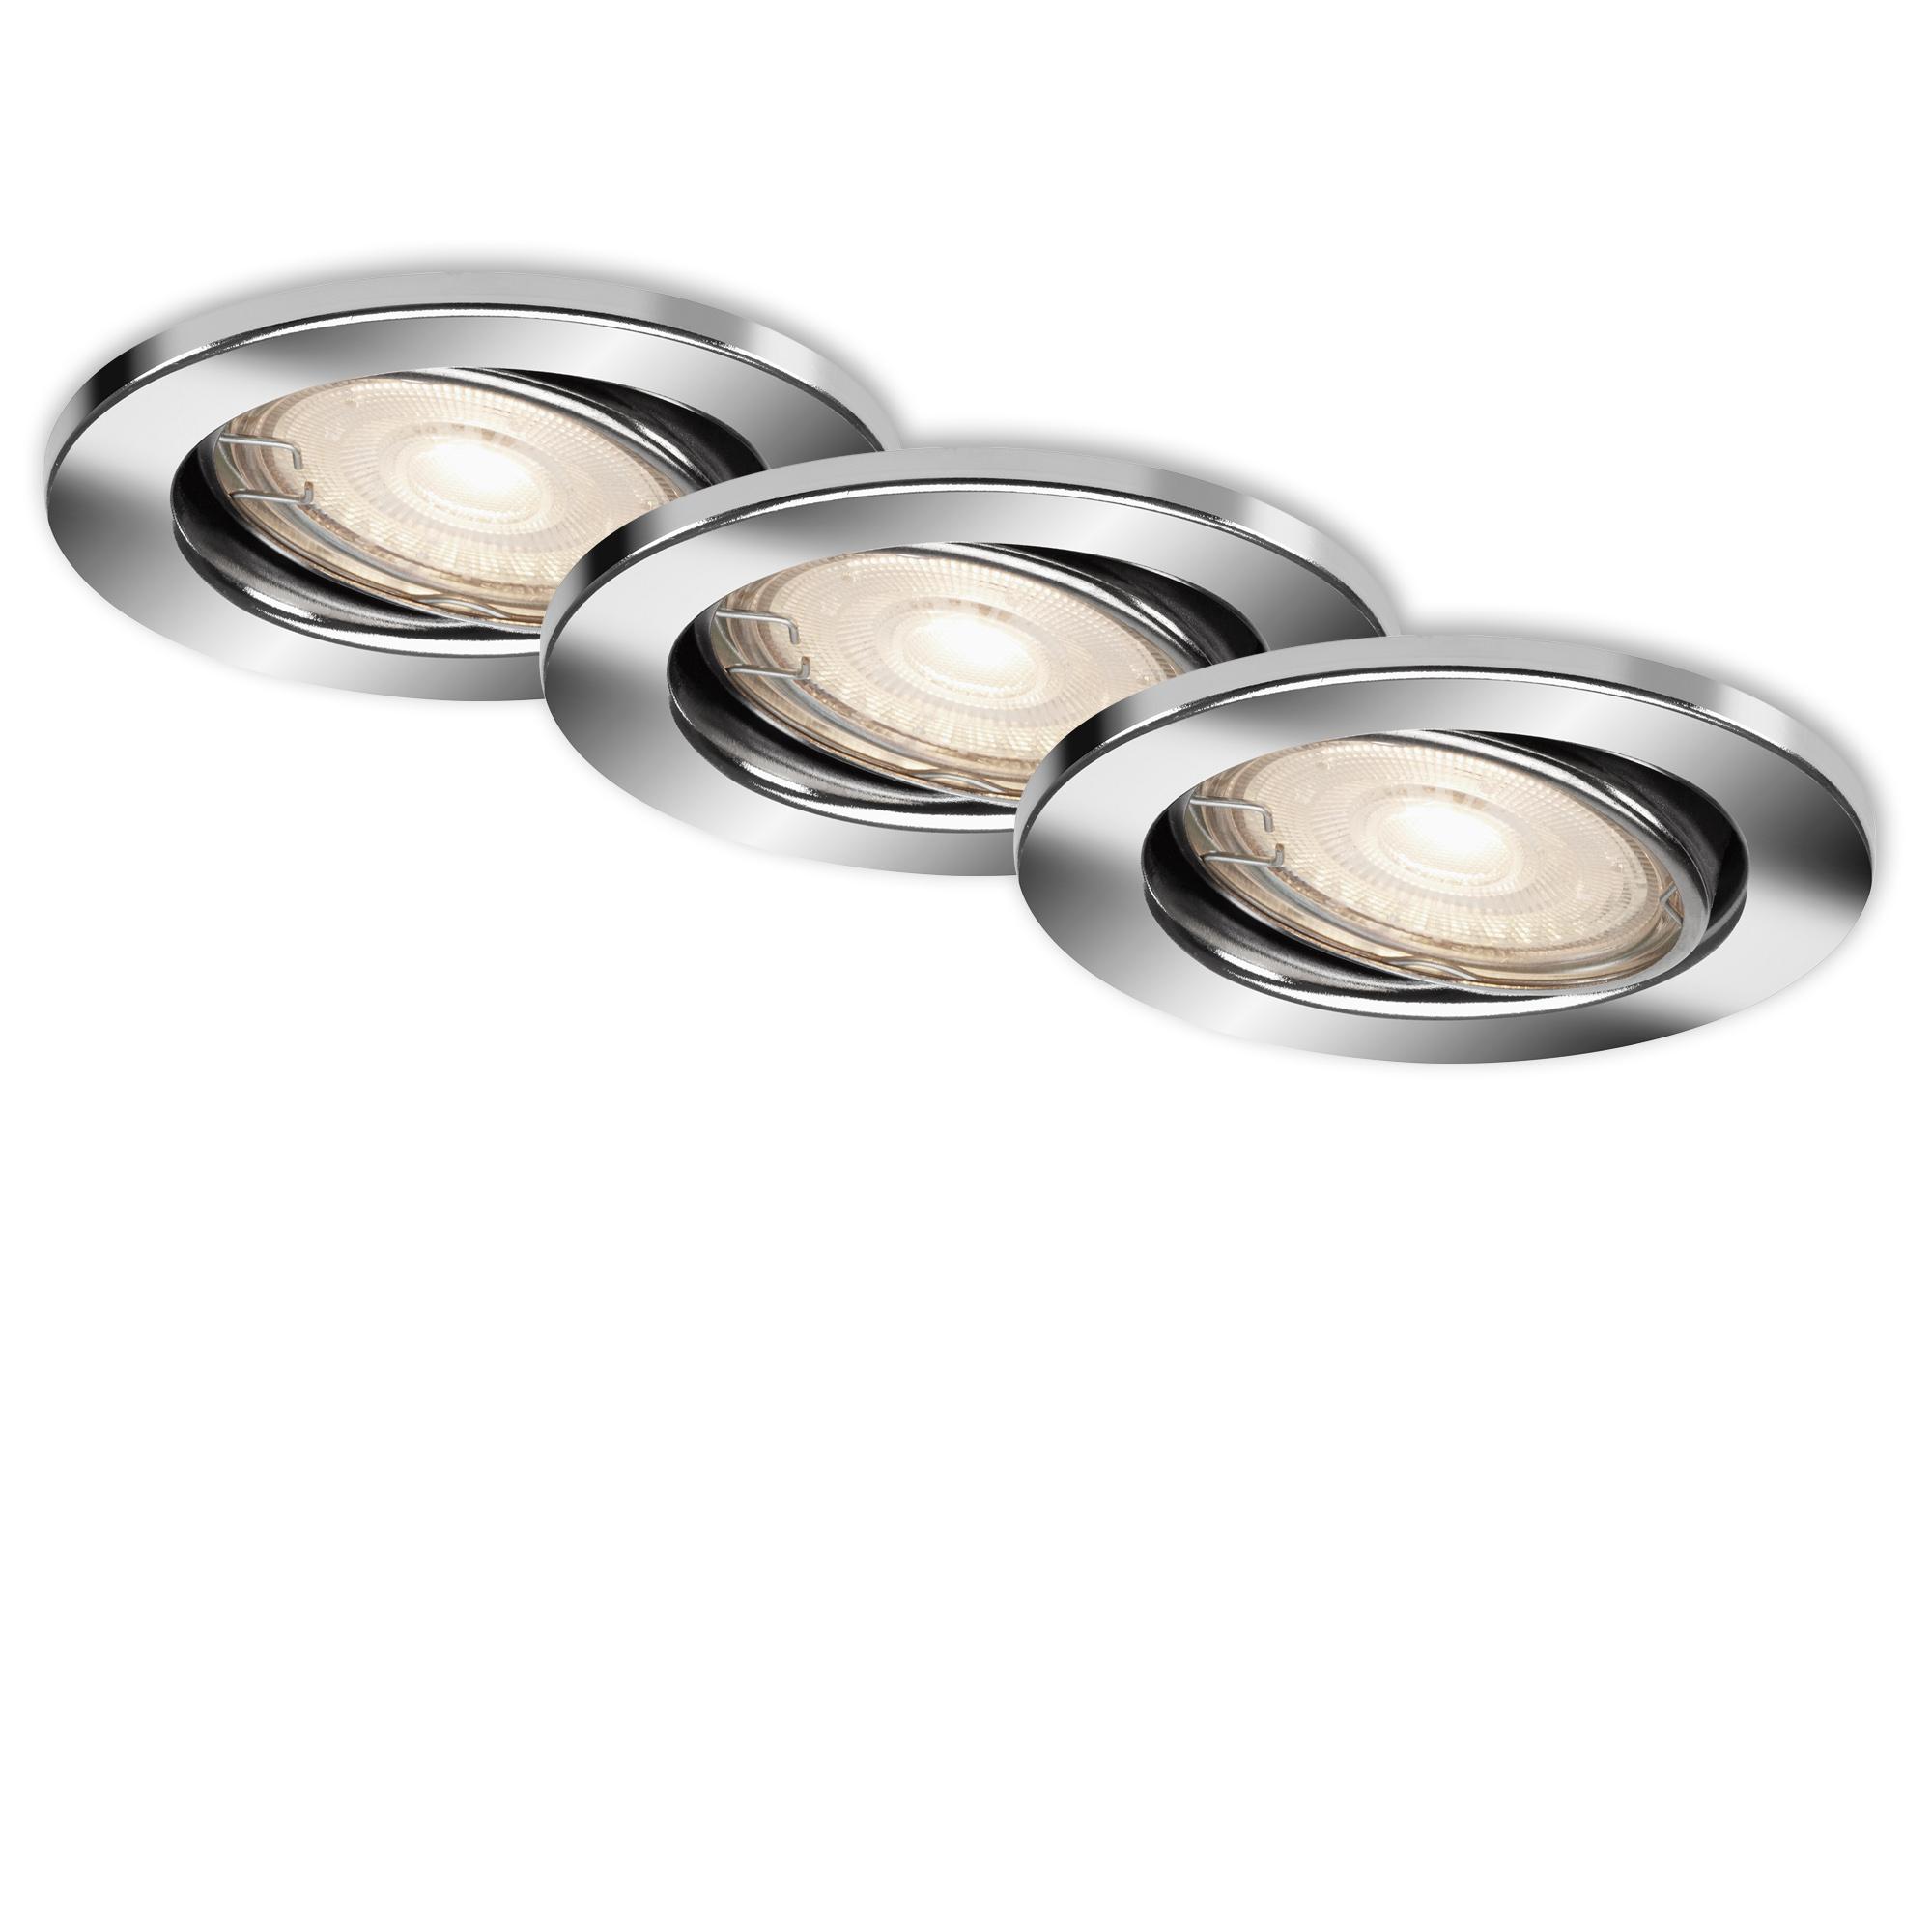 3er Set LED Einbauleuchte Chrom